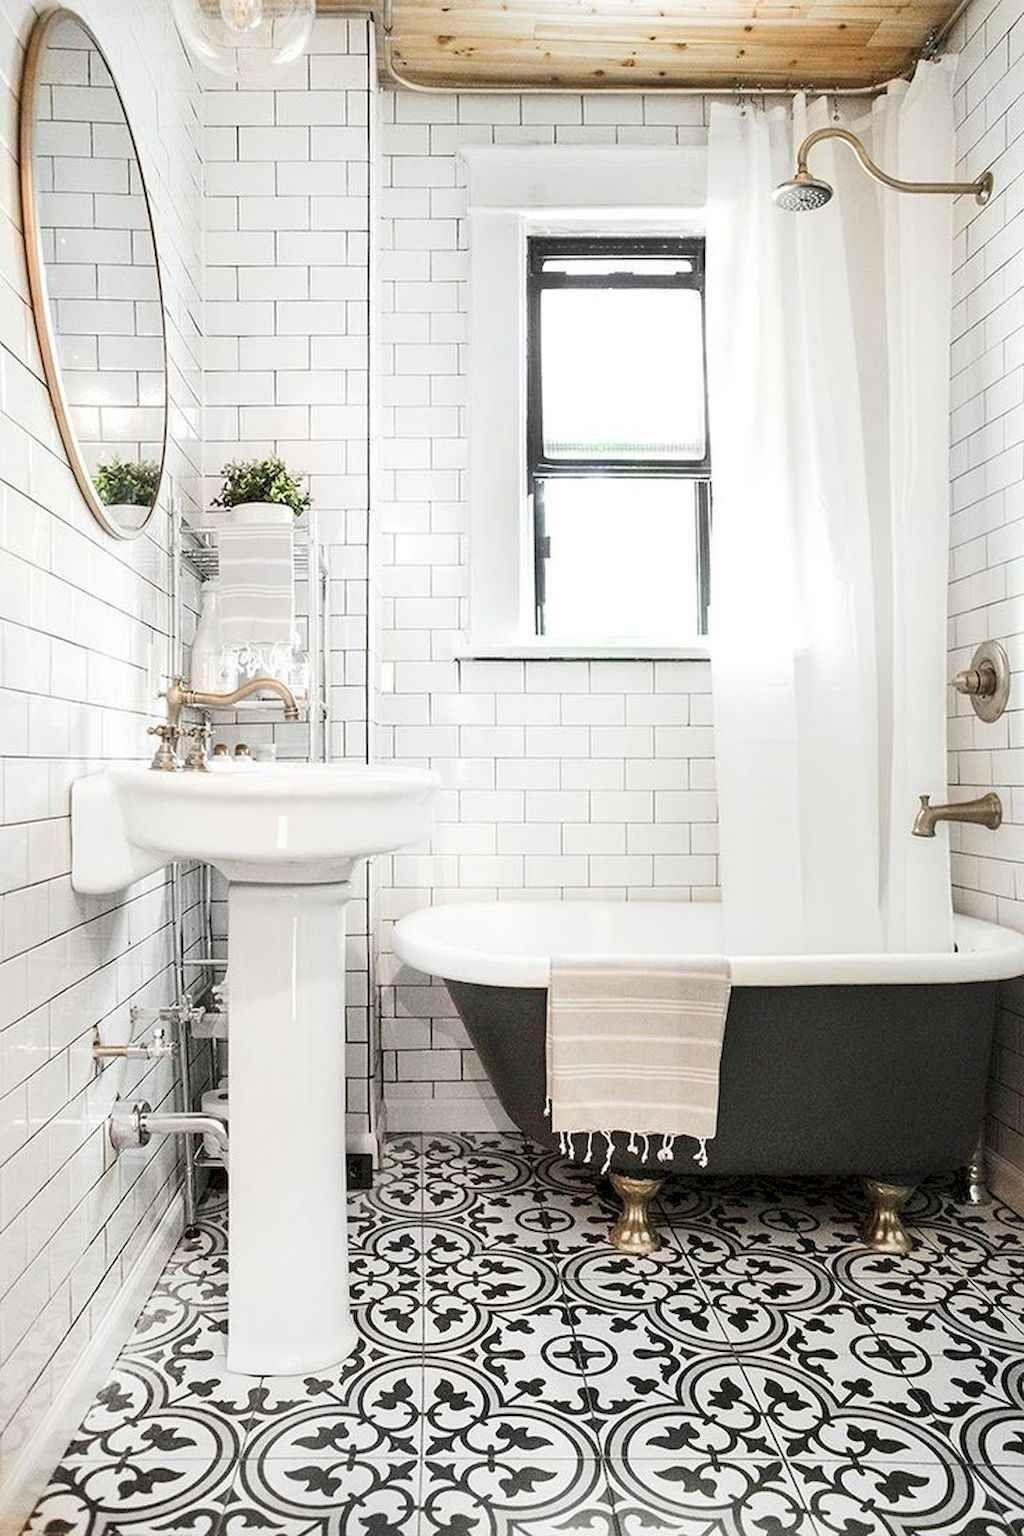 100 Farmhouse Bathroom Tile Shower Decor Ideas And Remodel To Inspiring Your Bathroom 89 bathroom #100 #farmhouse #bathroom #tile #shower #decor #ideas #and #remodel #to #inspiring #your #bathroom #89